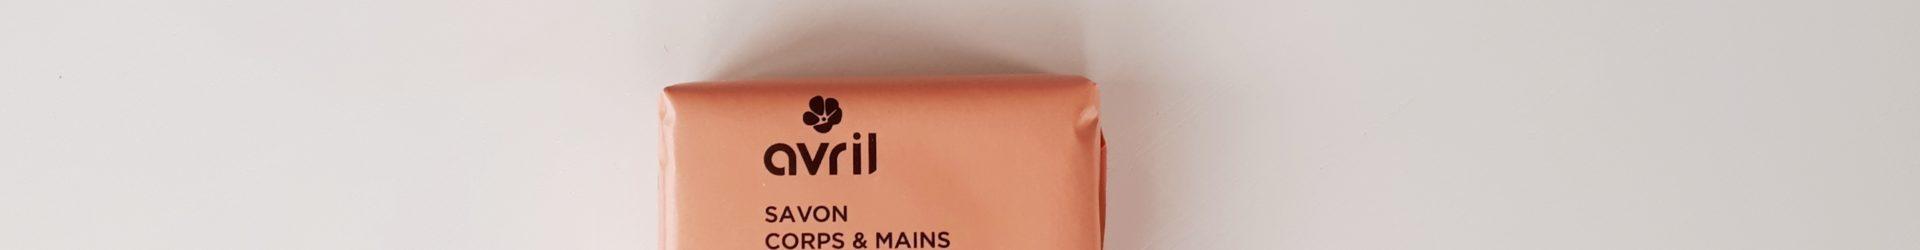 Avril – Savon corps & mains (Fleur d'oranger) (100g)